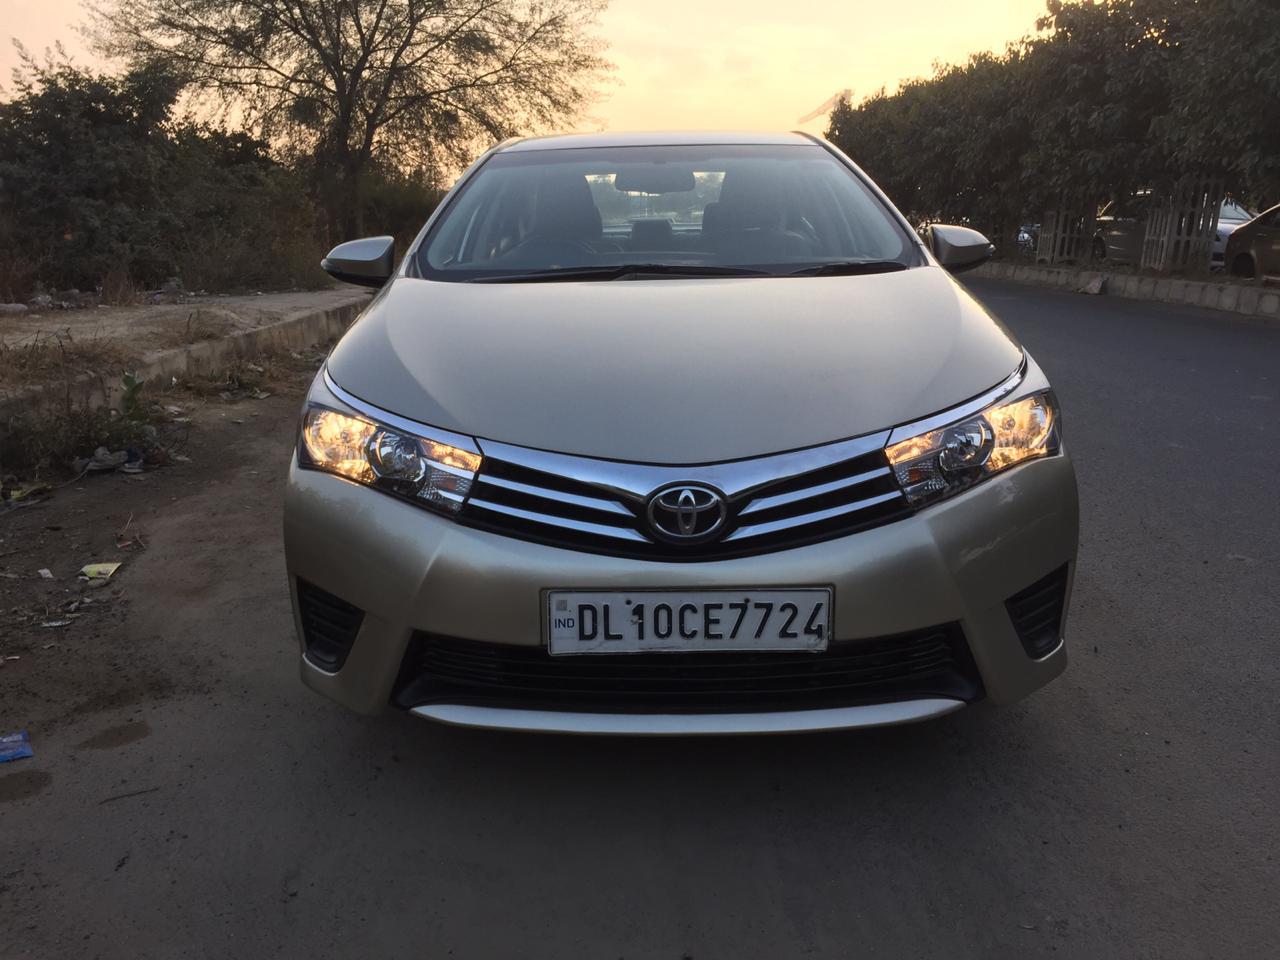 Secondhand Corolla Altis-G car in Dwarka and Uttam Nagar